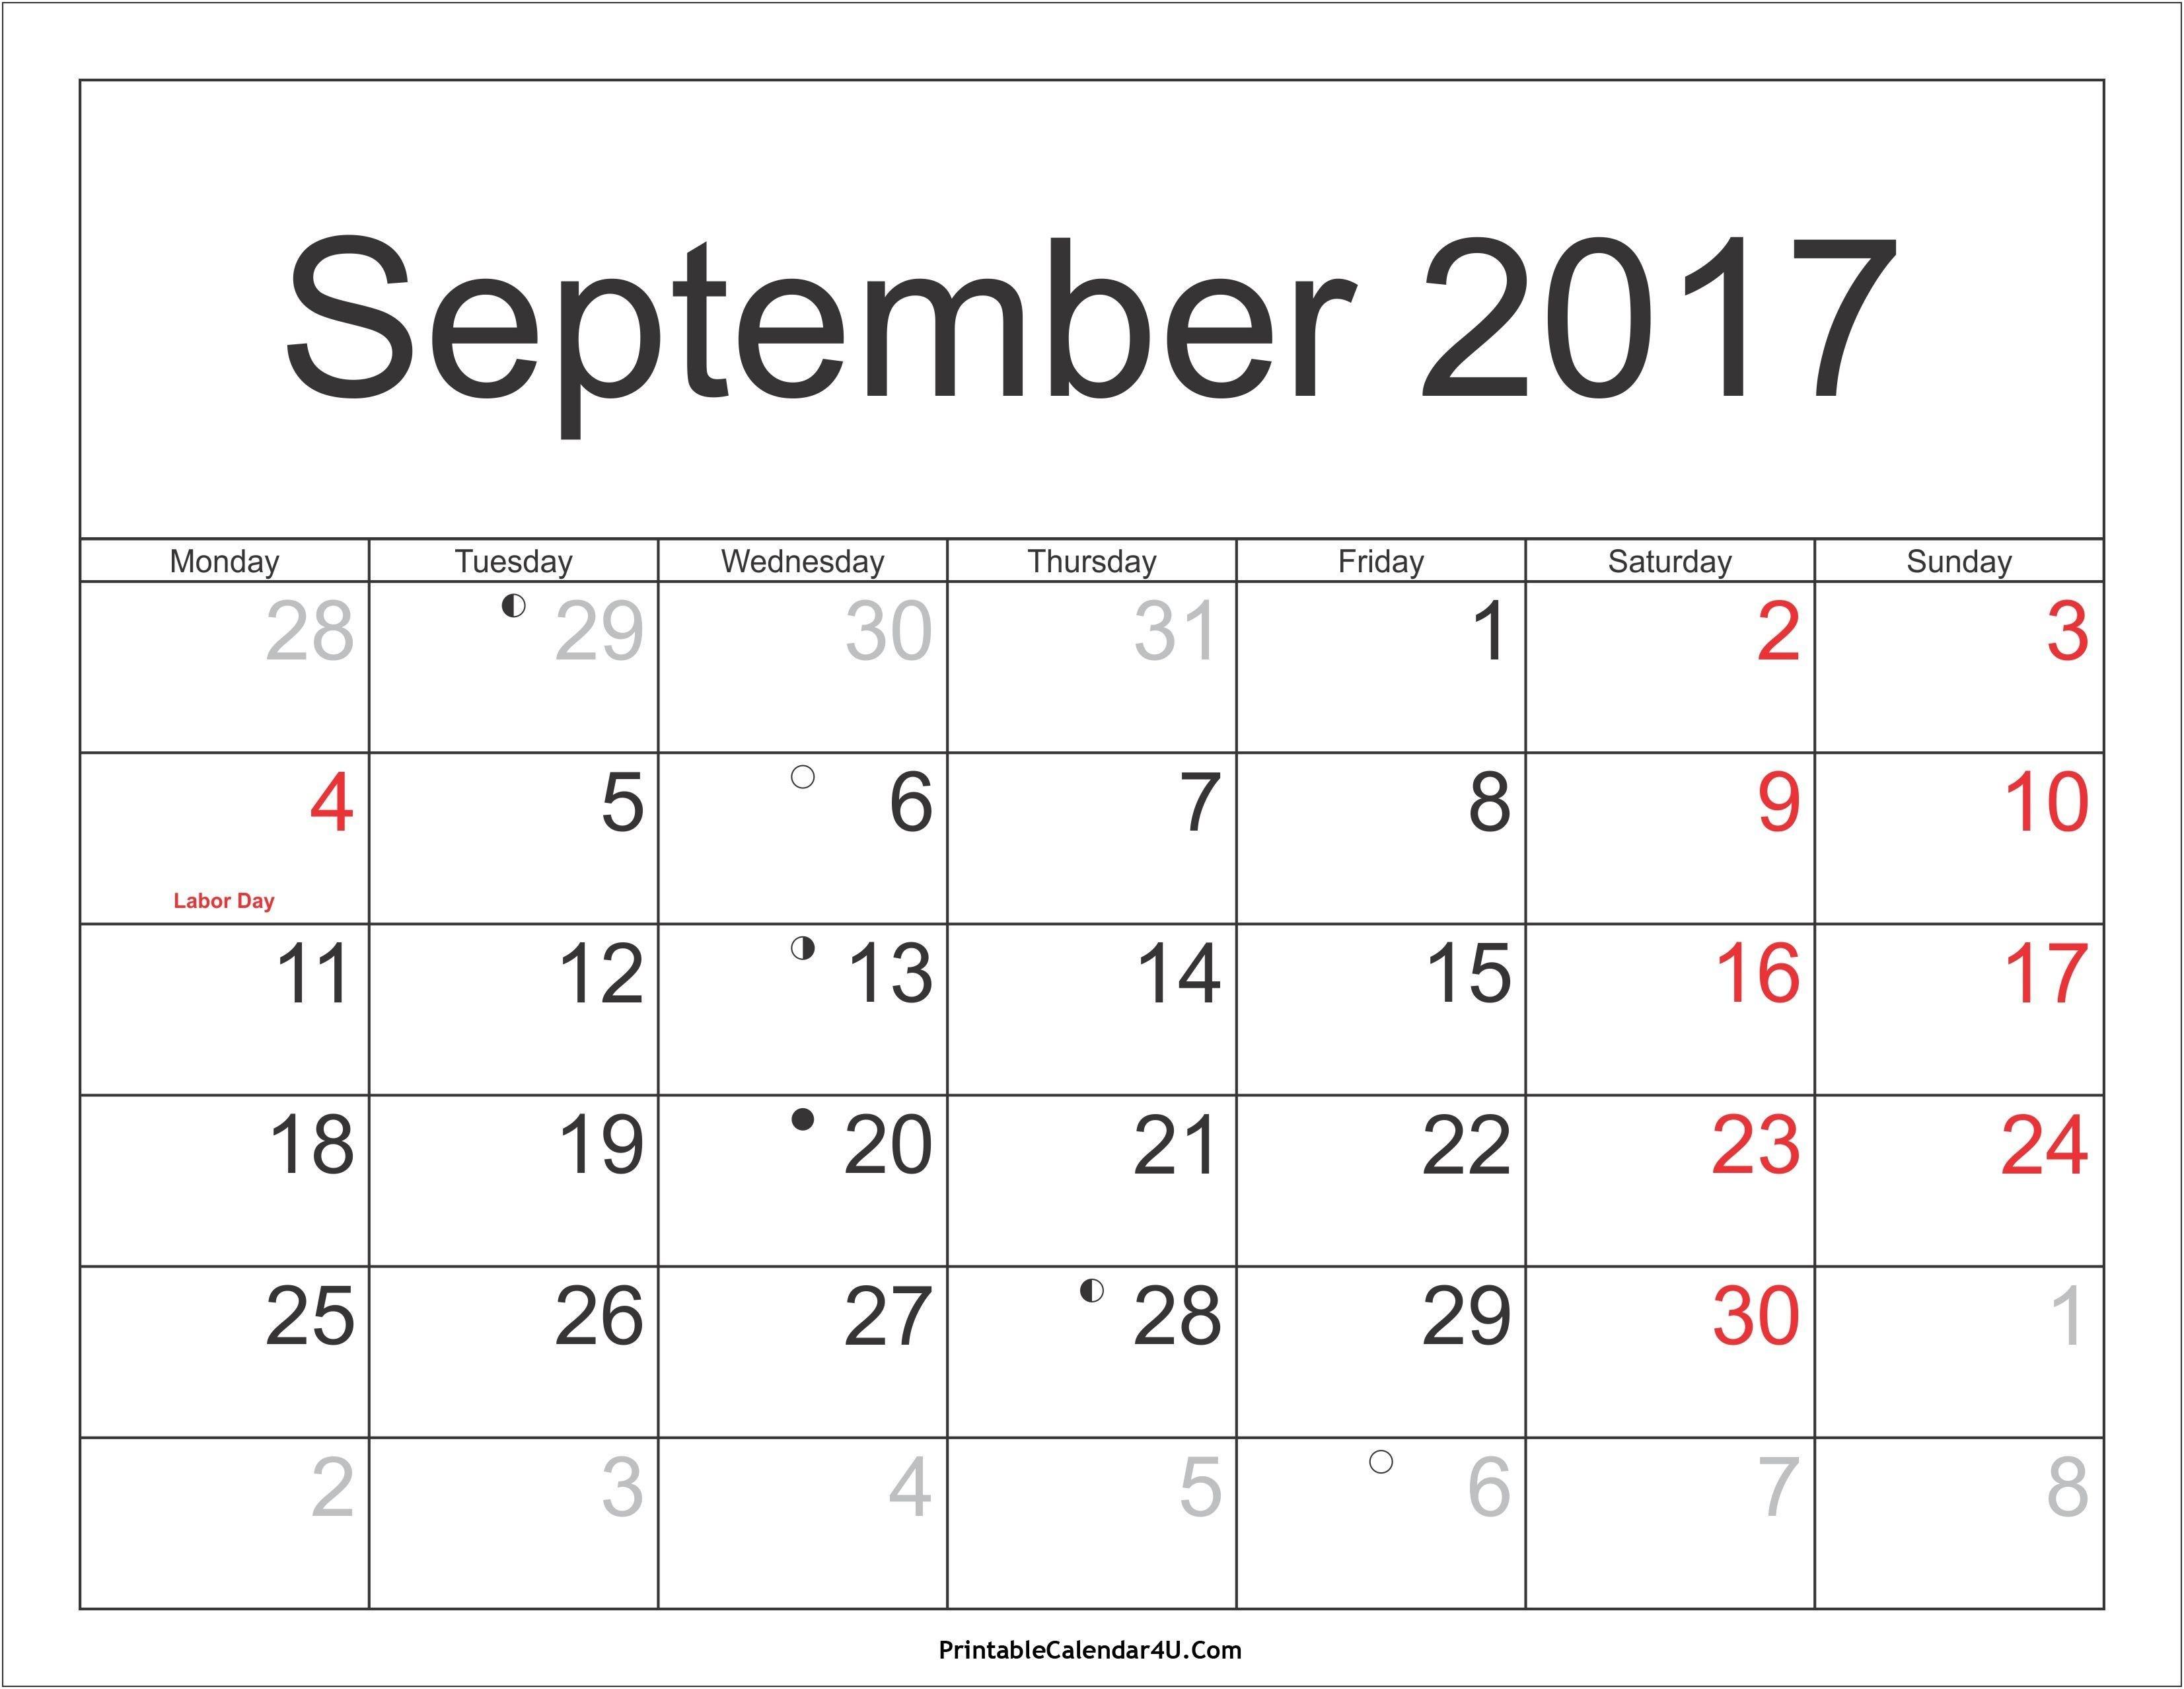 March Calendar 2018 Más Arriba-a-fecha Tamil Calendar for April 2019 2018 Calendar Printable with Holidays Of March Calendar 2018 Más Recientes Calendar Template to Print Luxury Chore Chart Unique Chore Calendar